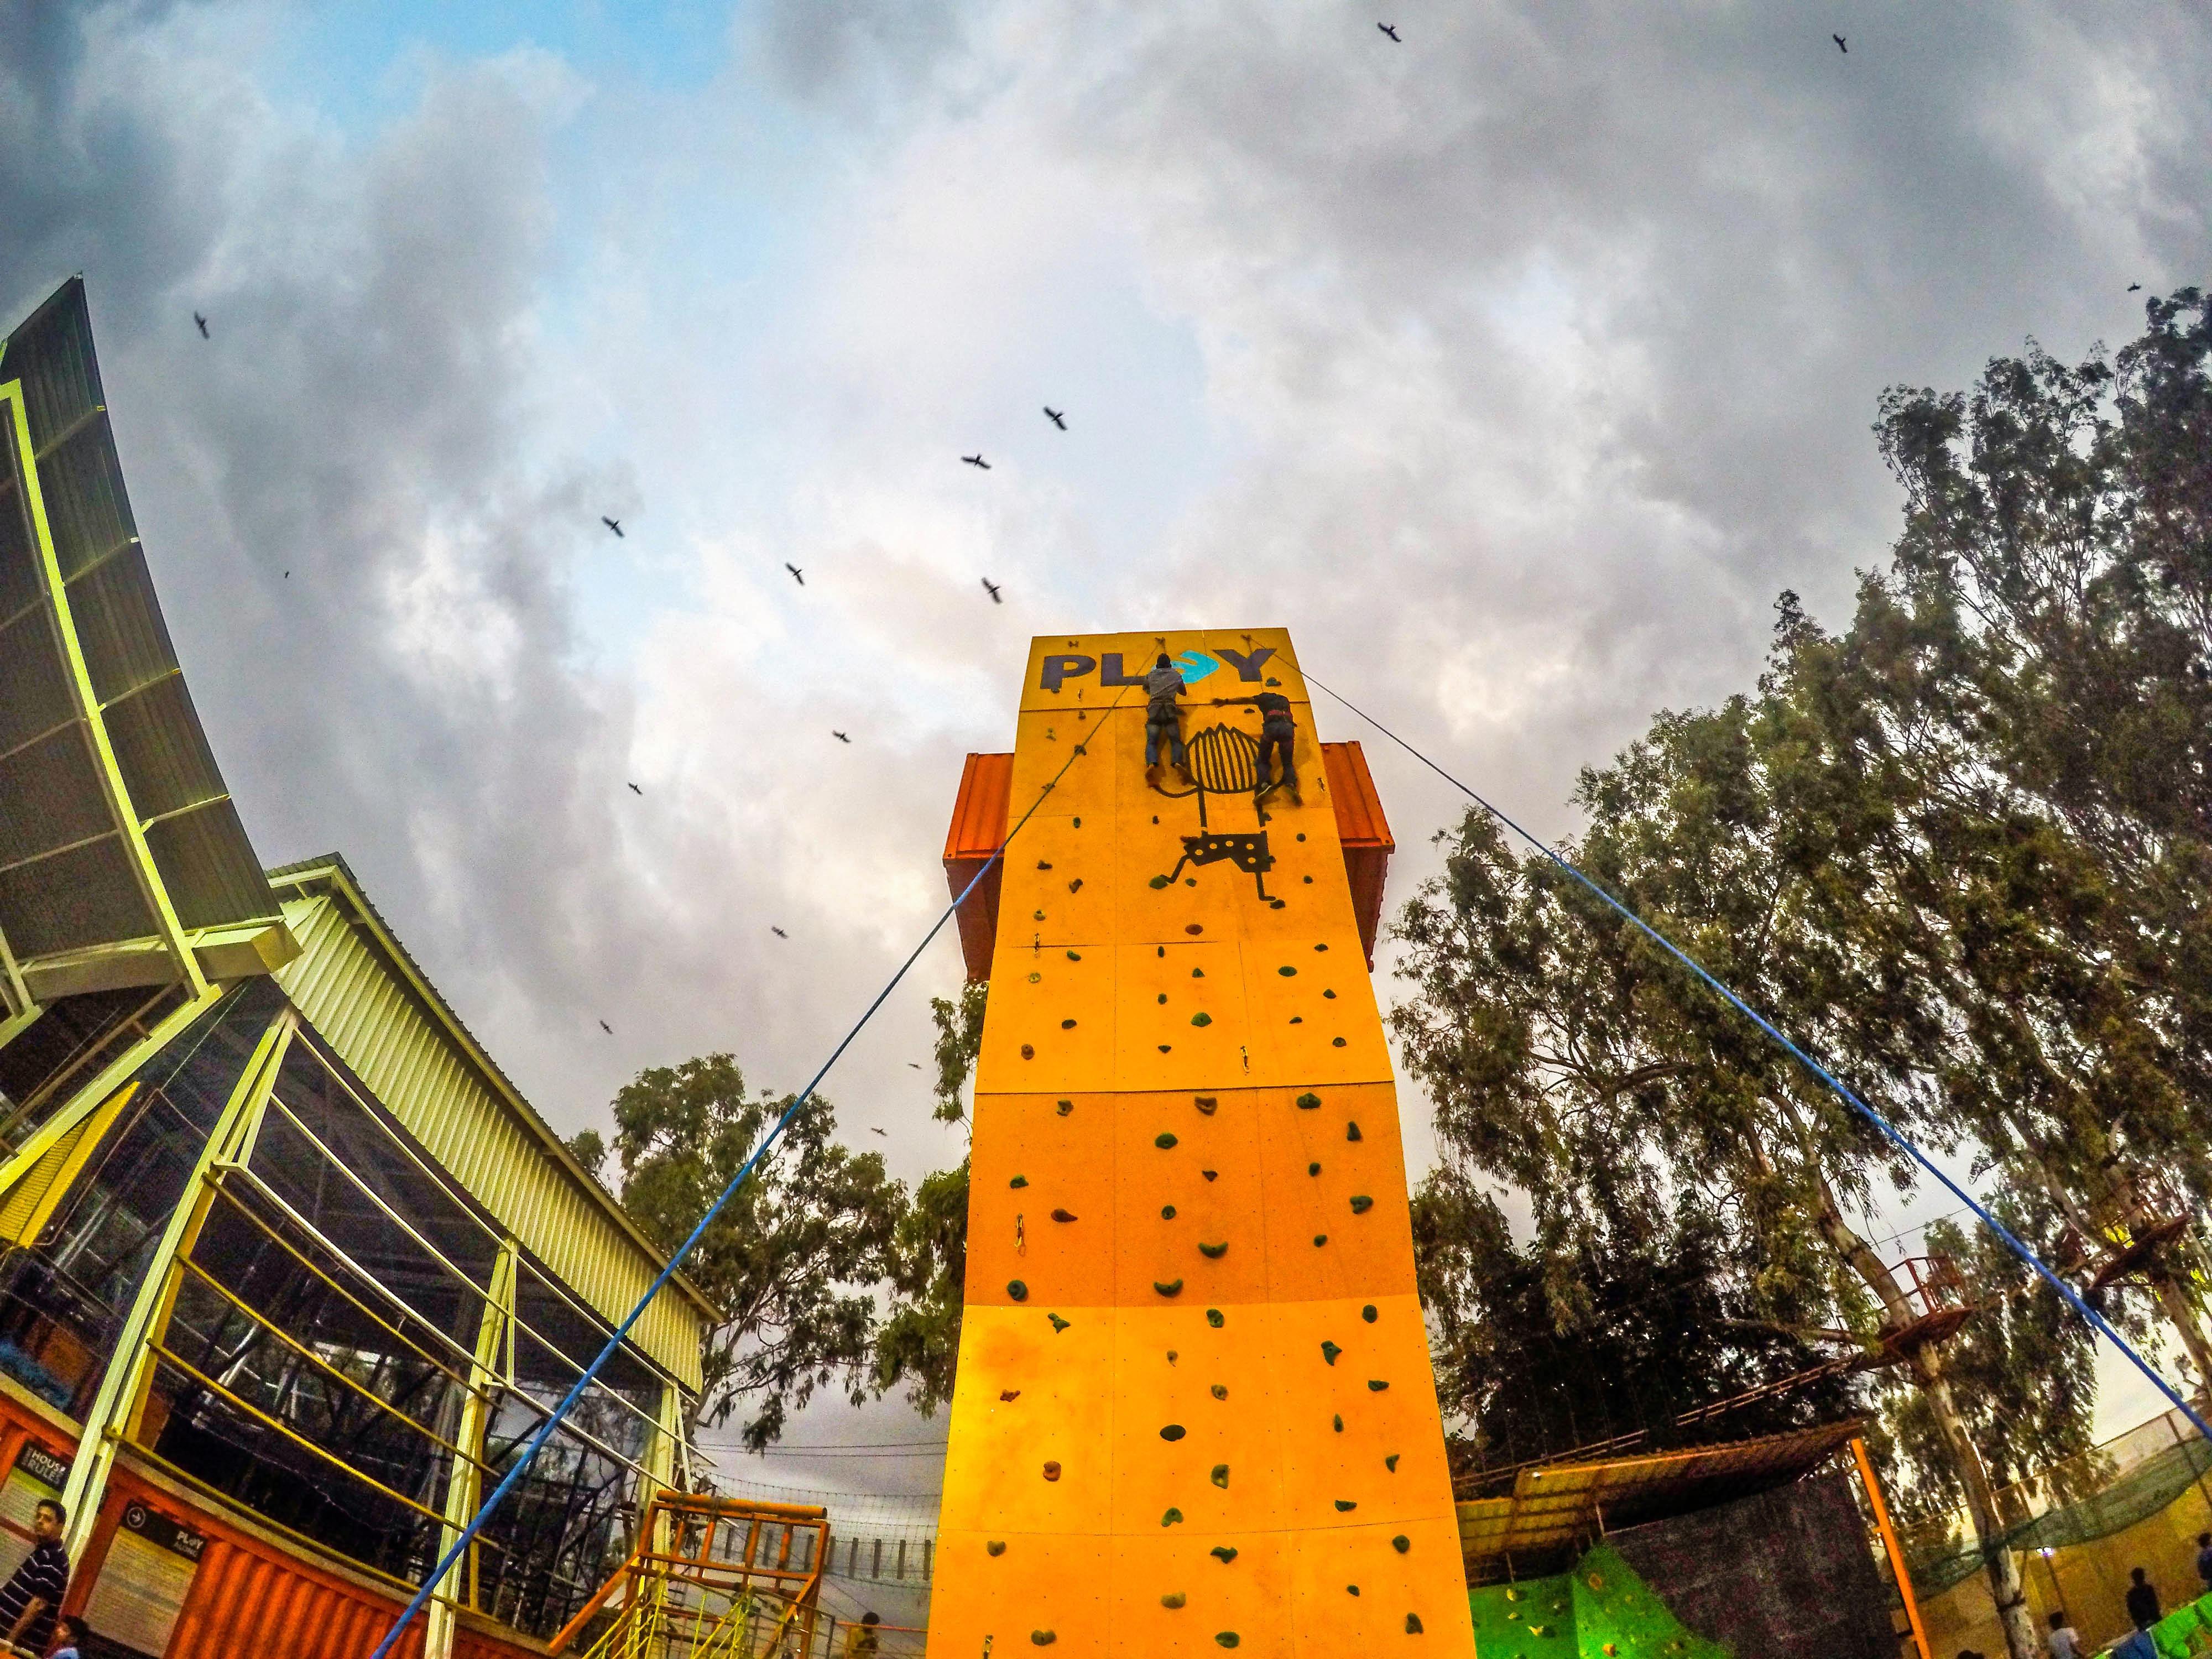 Climbing_wall1.jpg